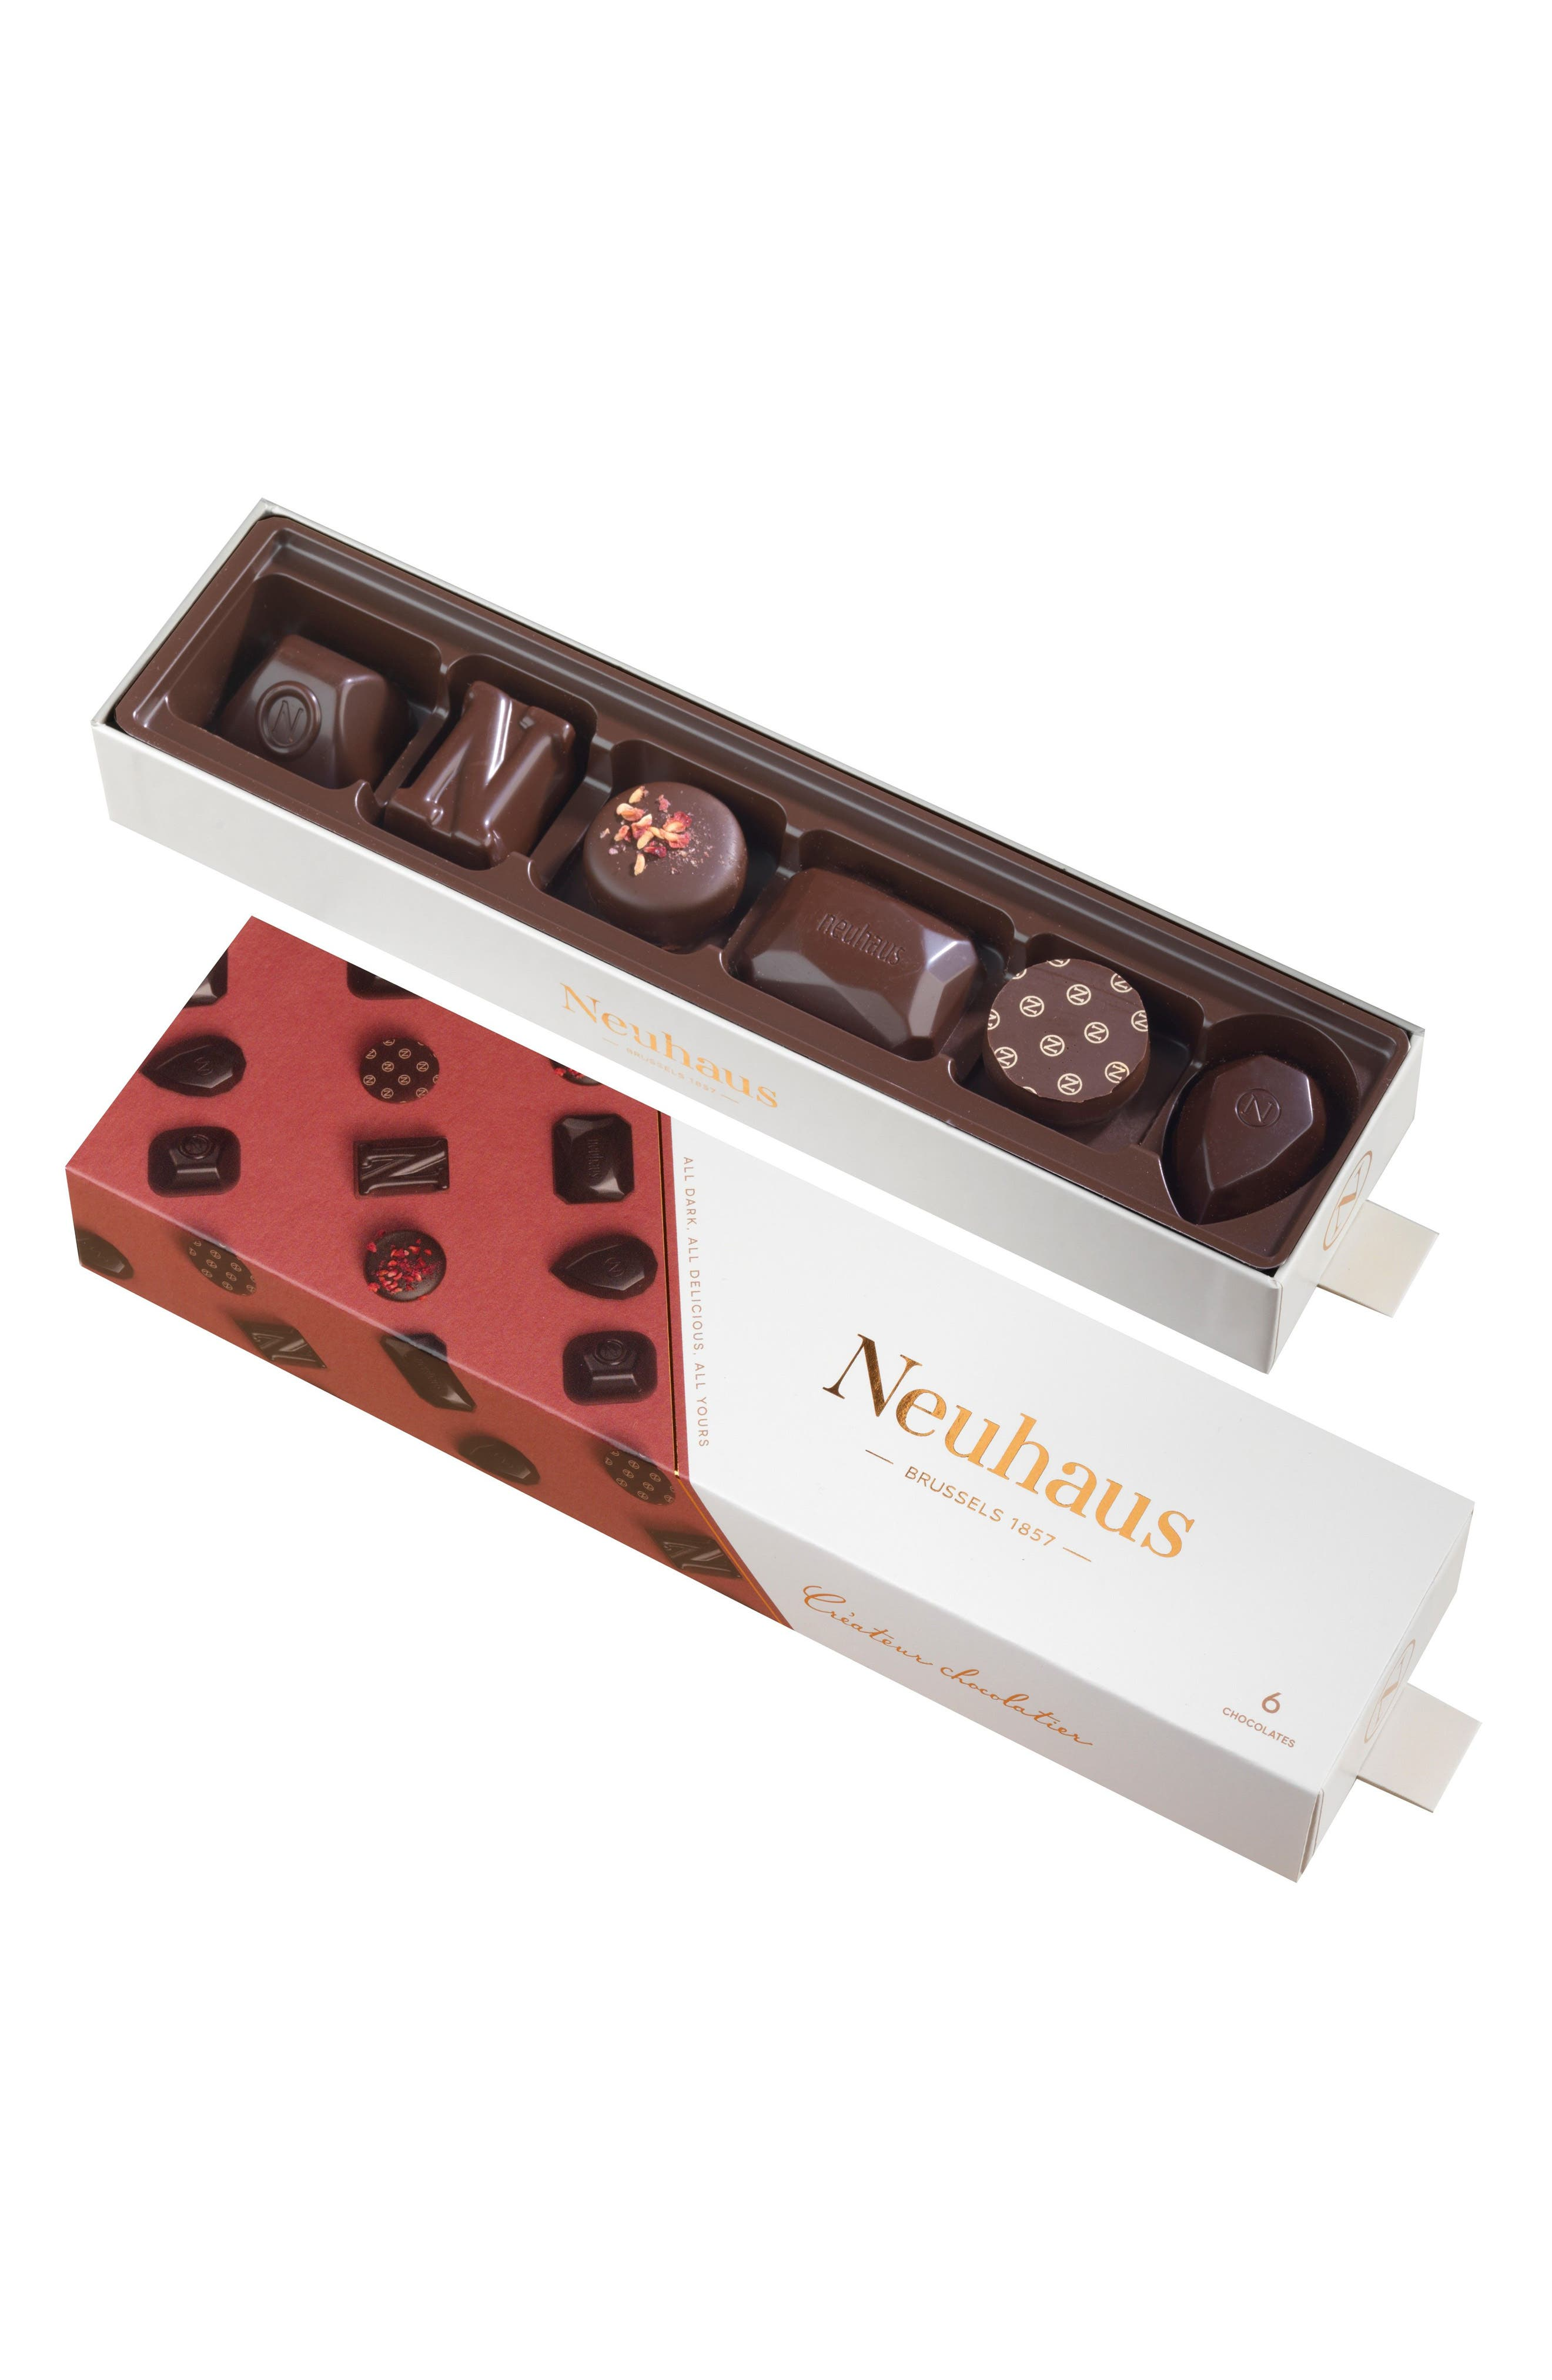 Main Image - Neuhaus Classic Chocolate Assortment Bundle